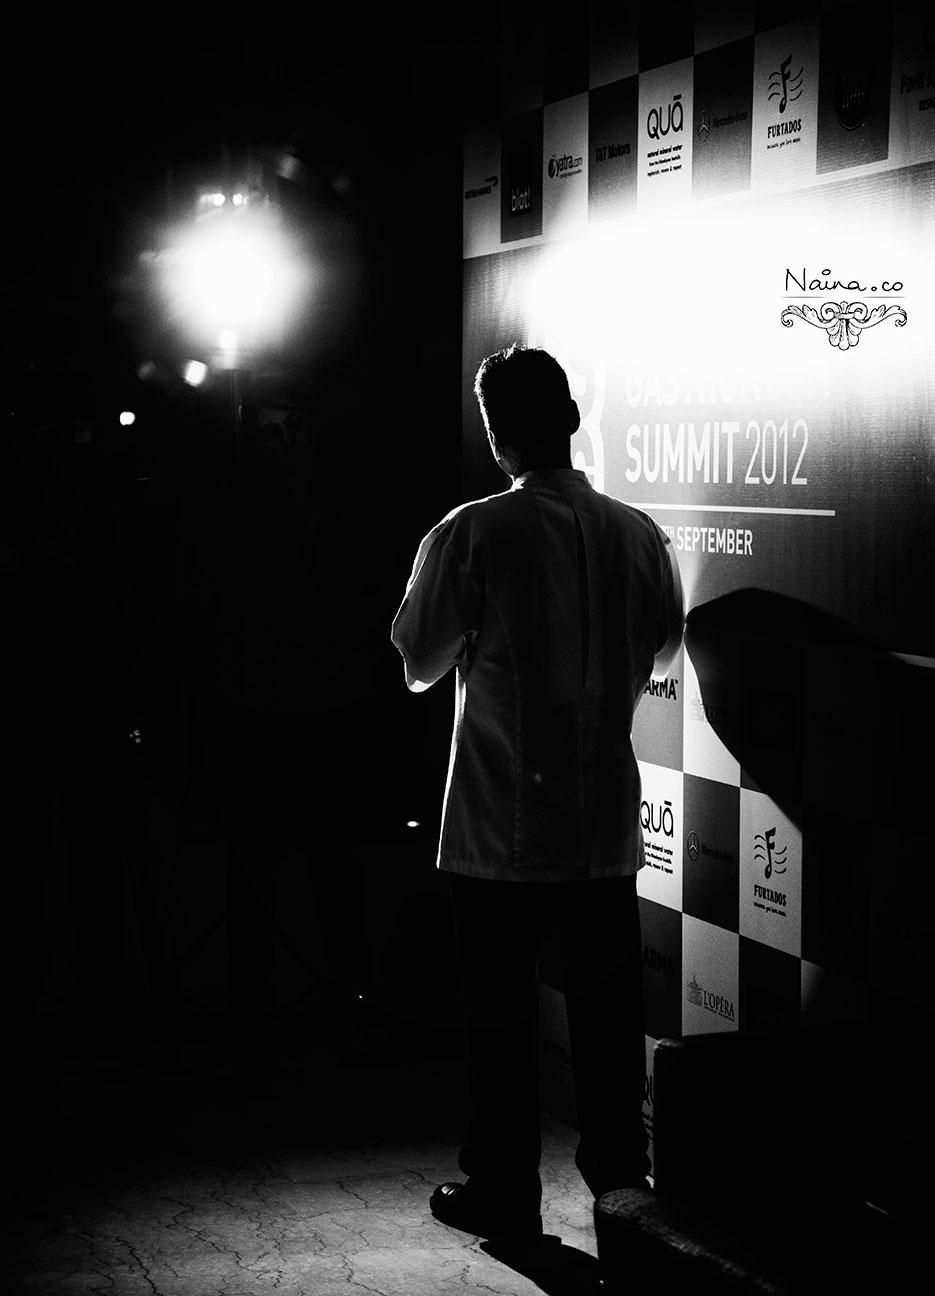 Chef Vineet Bhatia of Rasoi at the CSSG Gastronomy Summit, 2012 photographed by photographer Naina Redhu of Naina.co